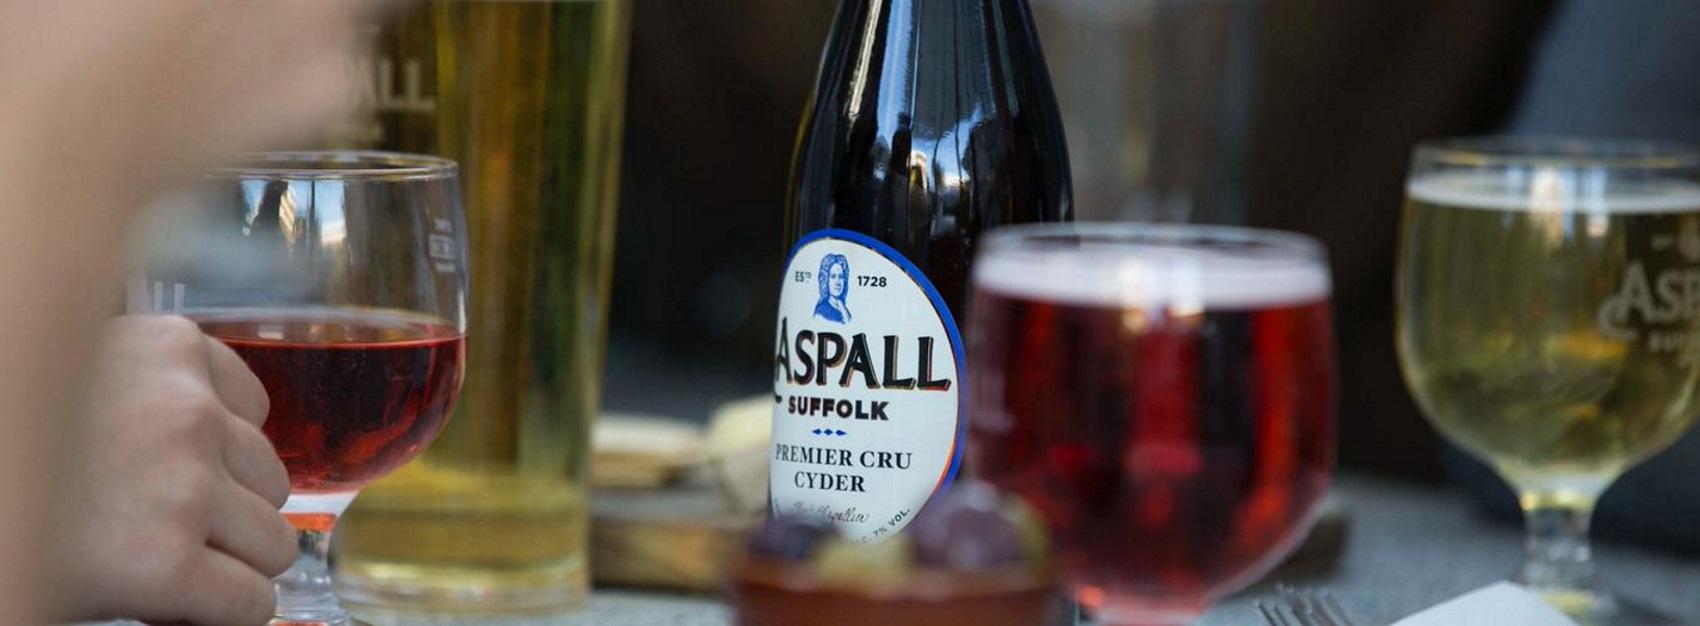 aspall cider banner